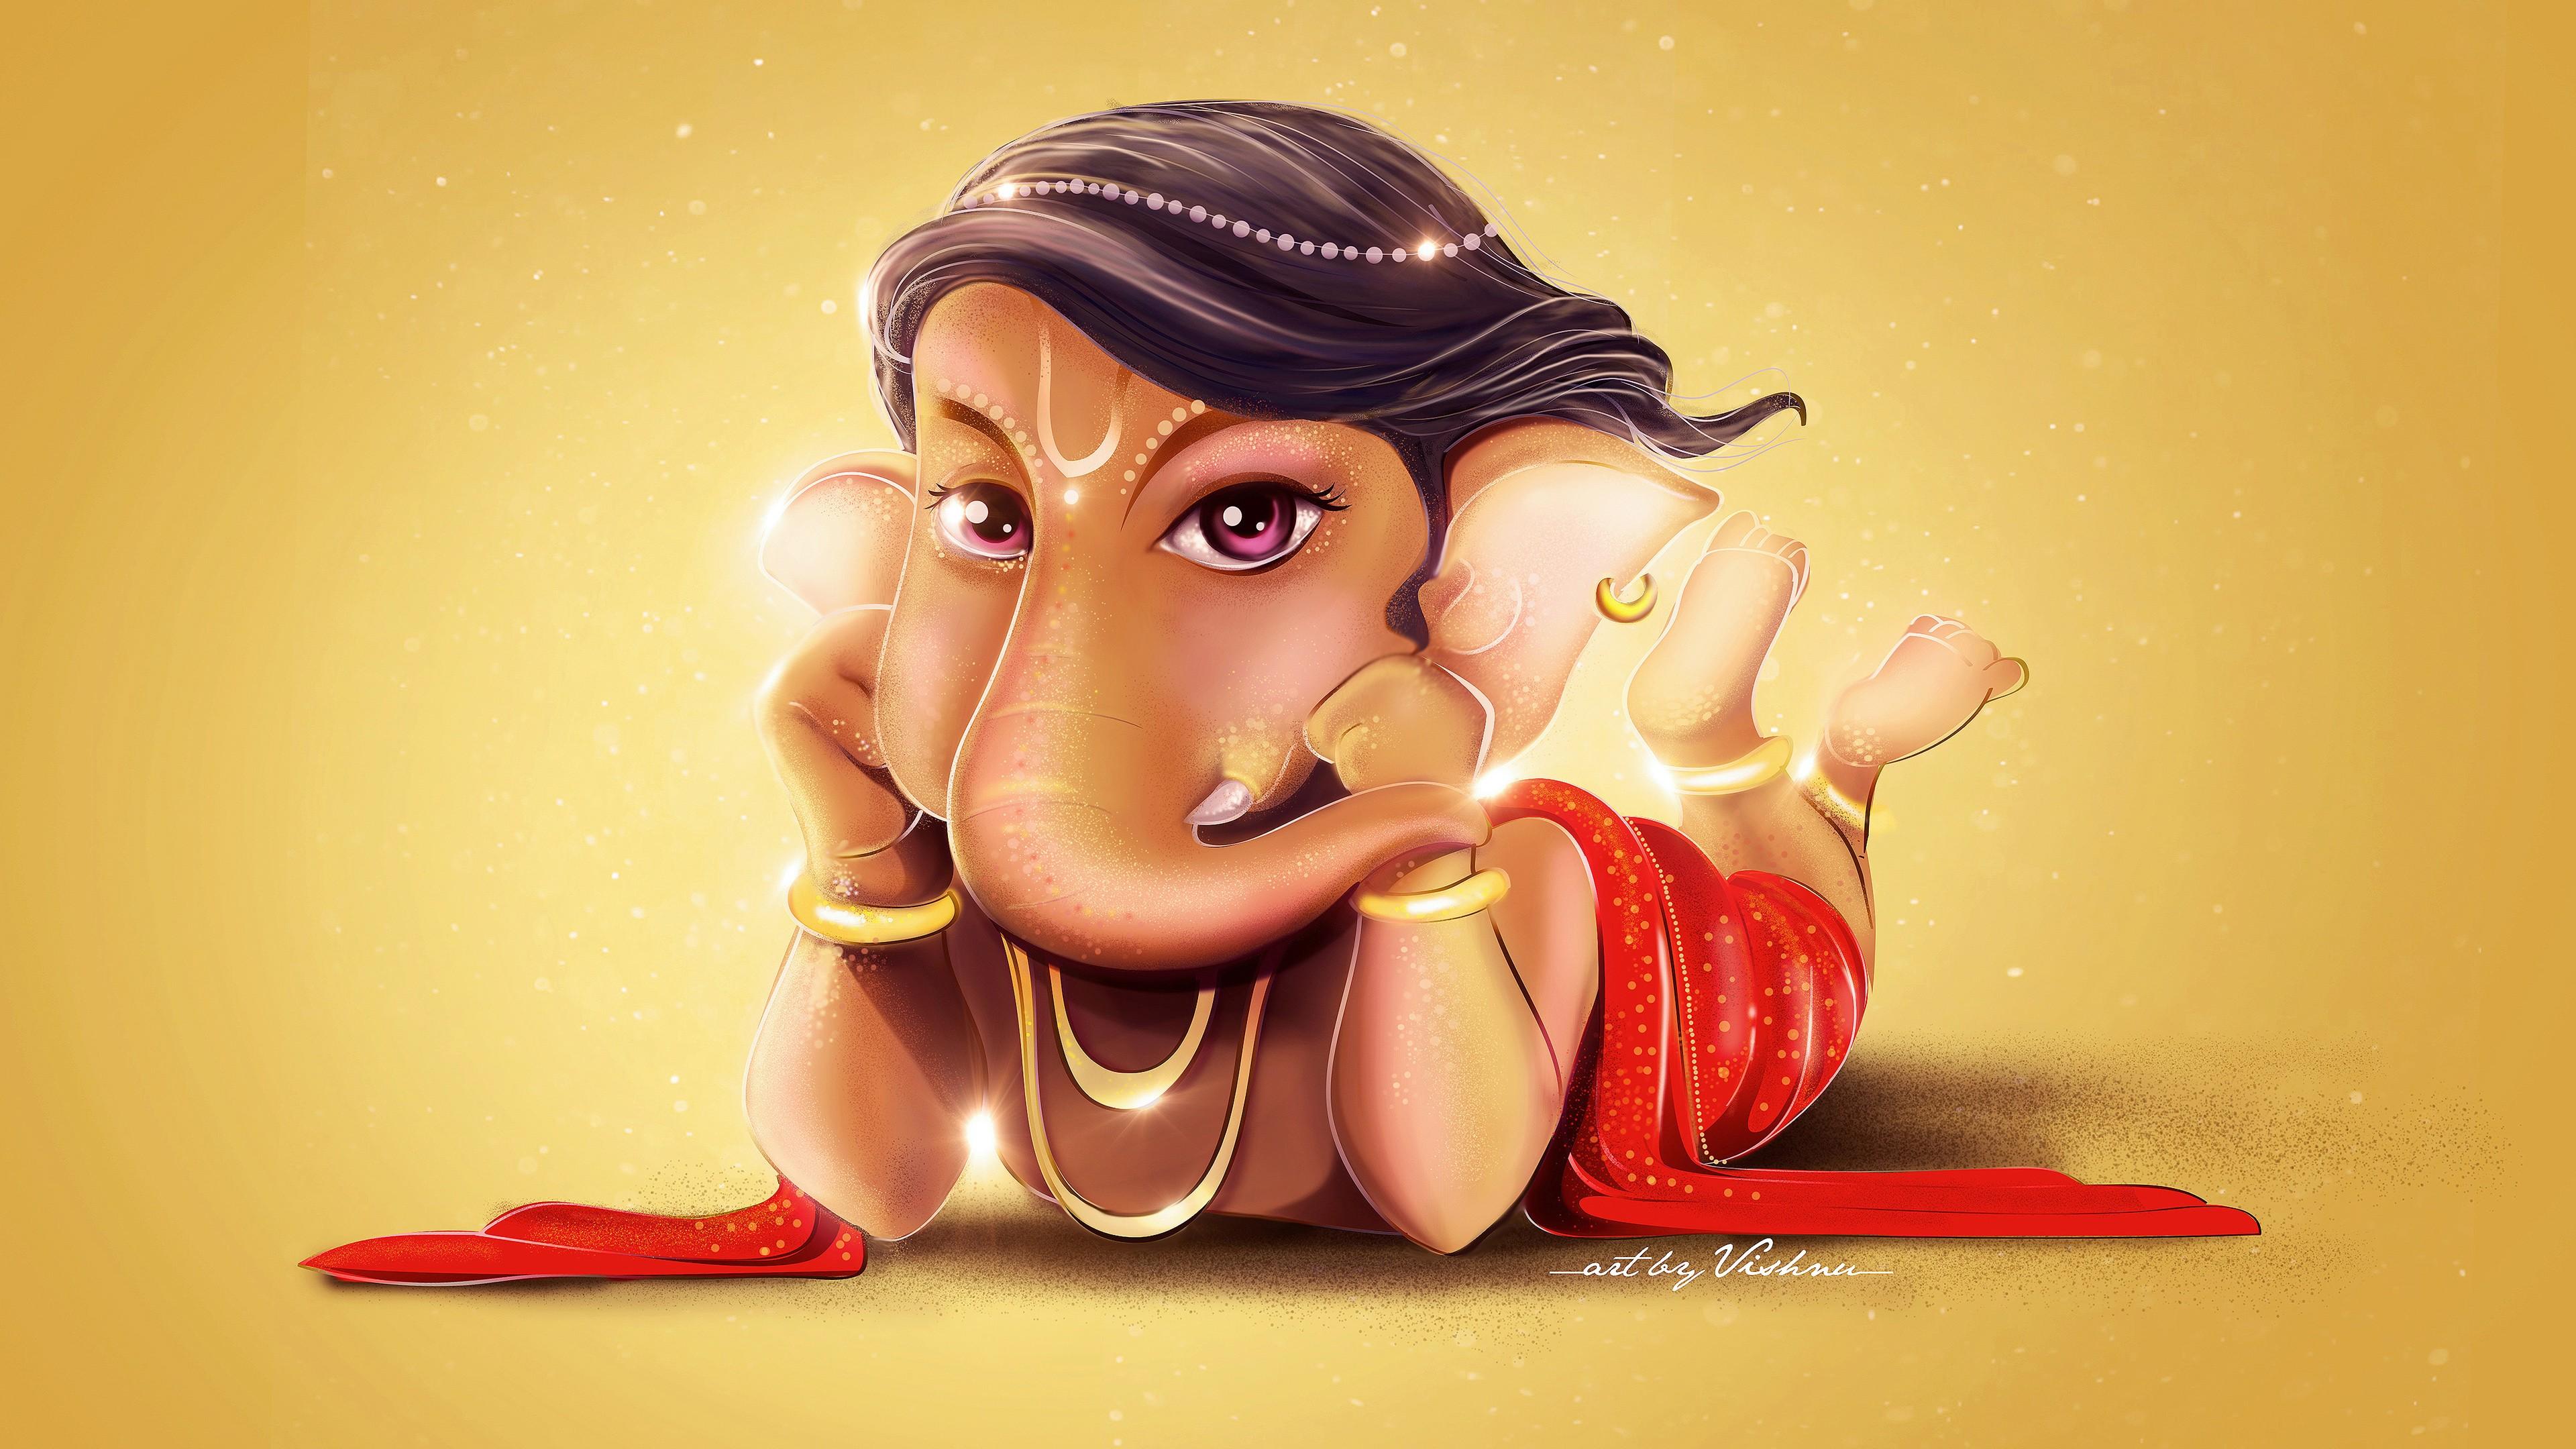 Cute Bal Ganesh Wallpaper Cute Lord Ganesha Hd 4k Wallpapers Hd Wallpapers Id 20942